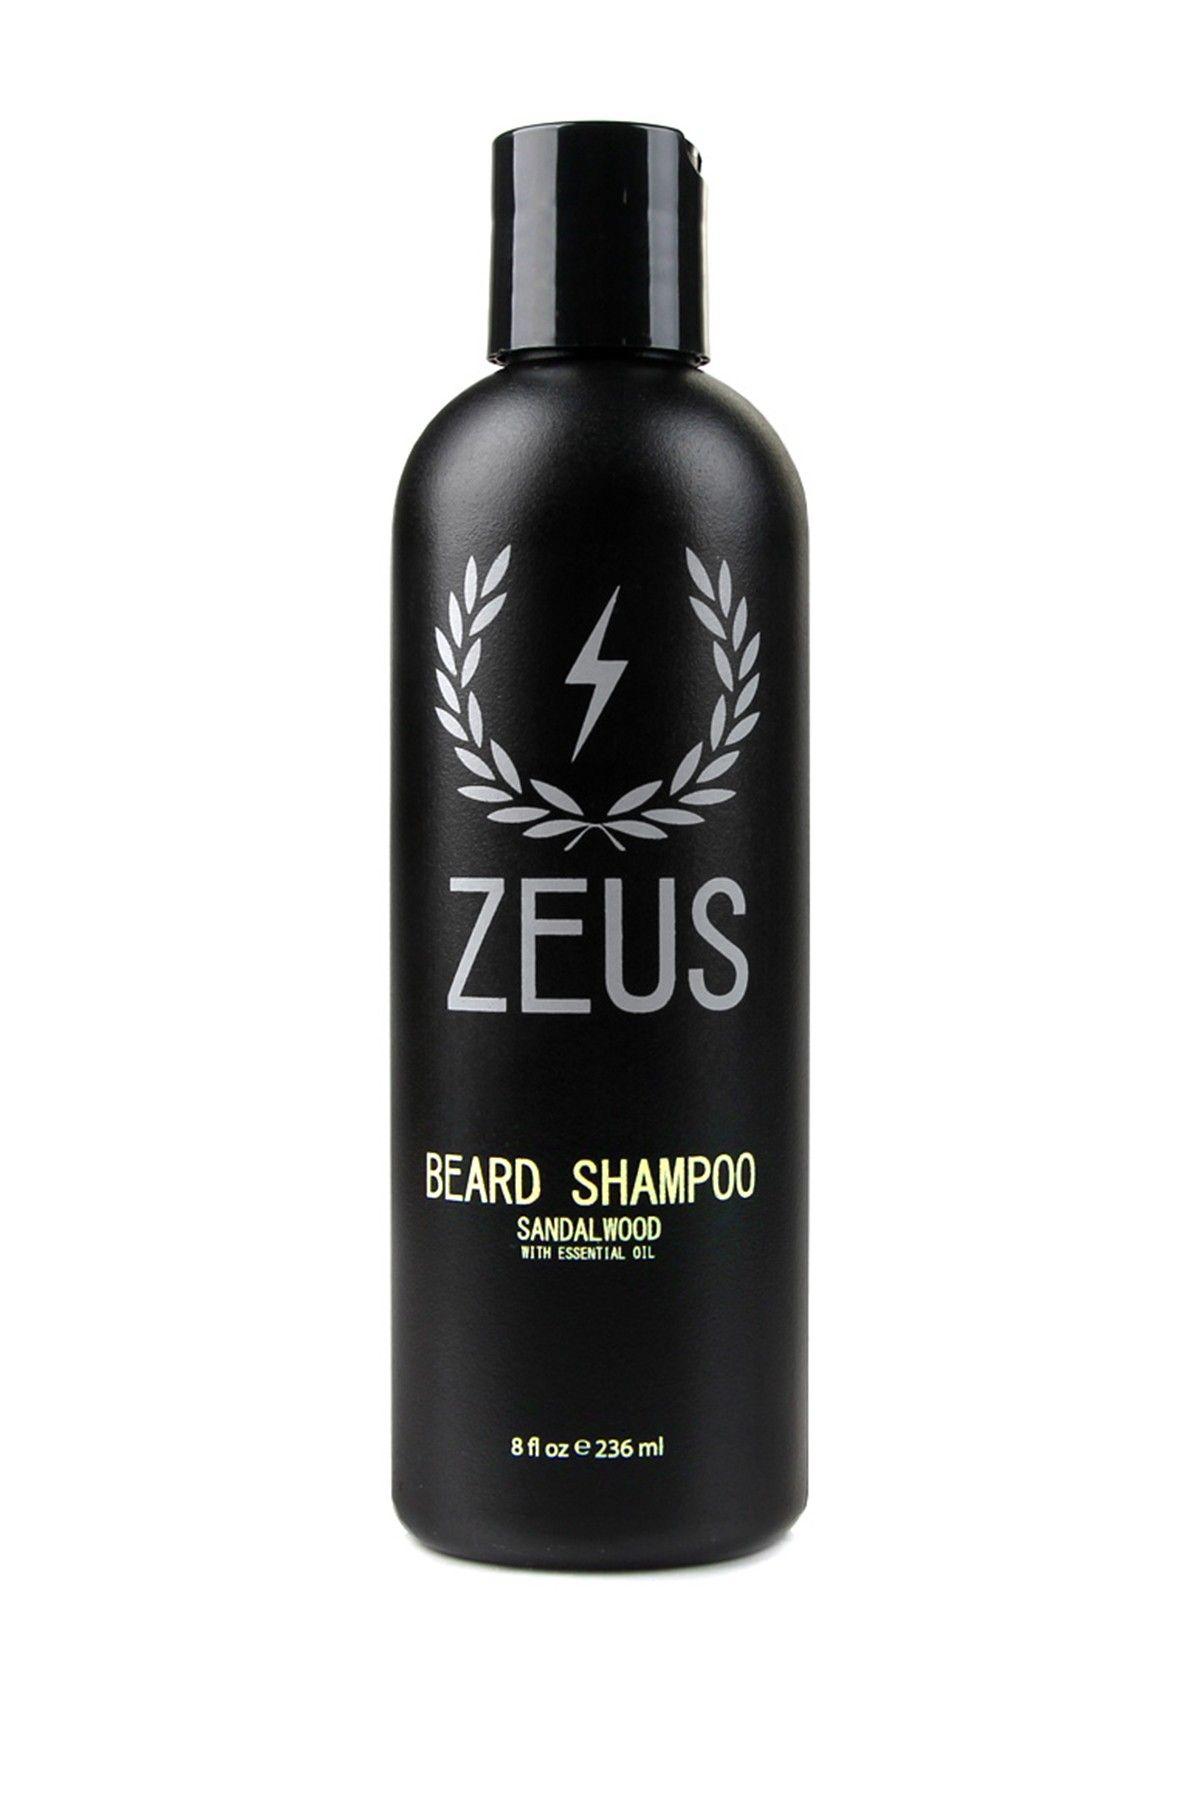 Beard Shampoo and Beard Conditioner Set for Men - Sandalwood